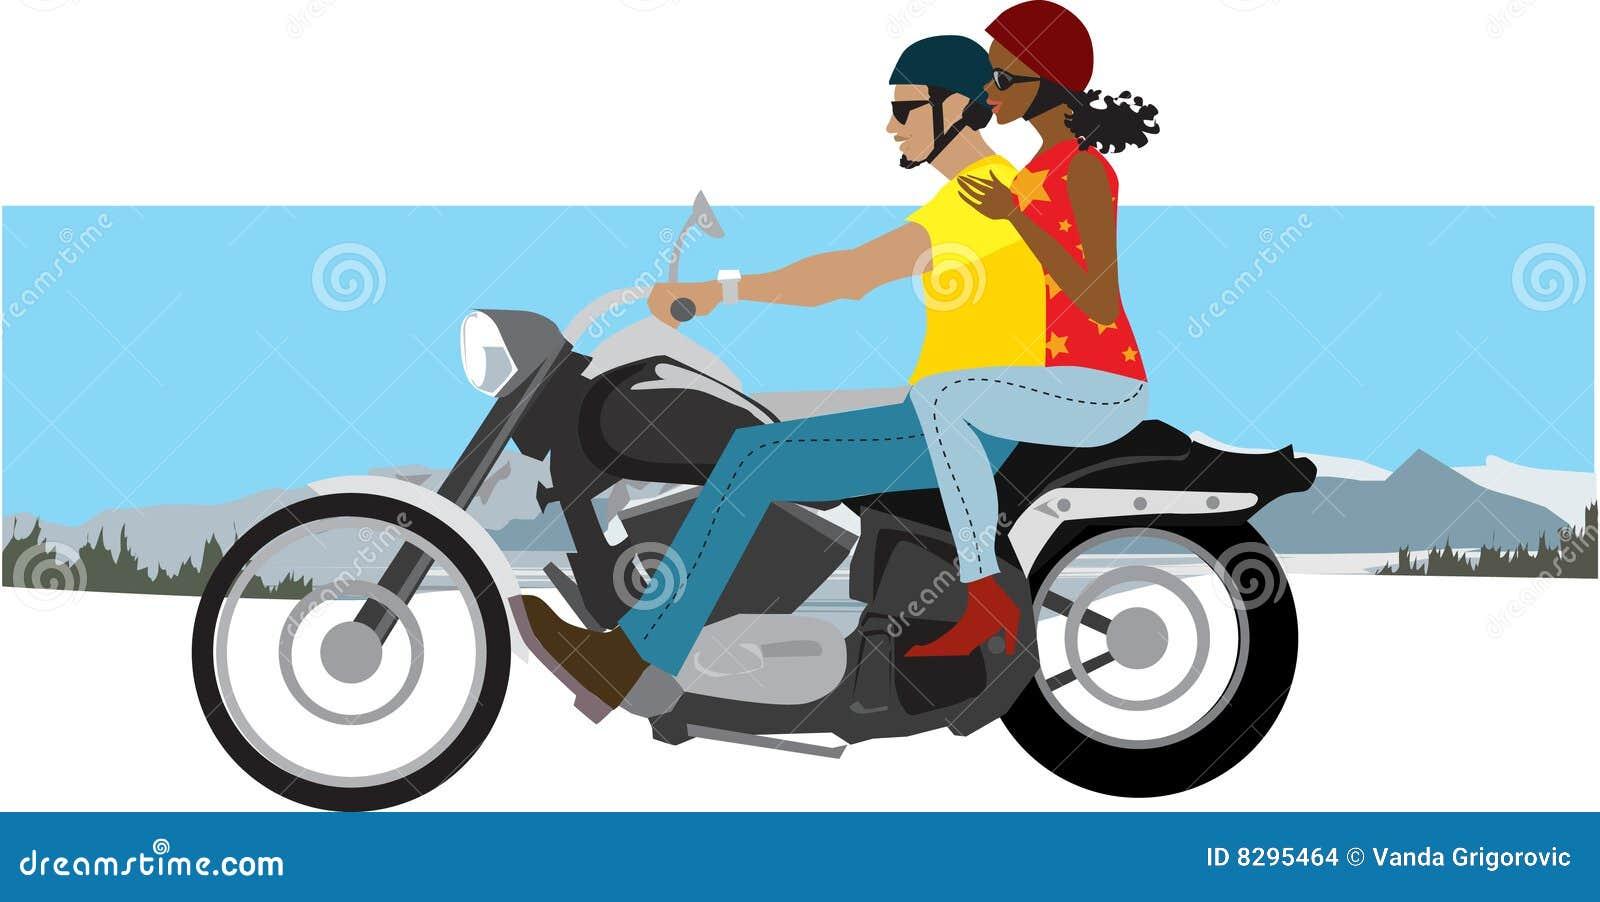 Motorcycle Wedding Invitations was luxury invitations template